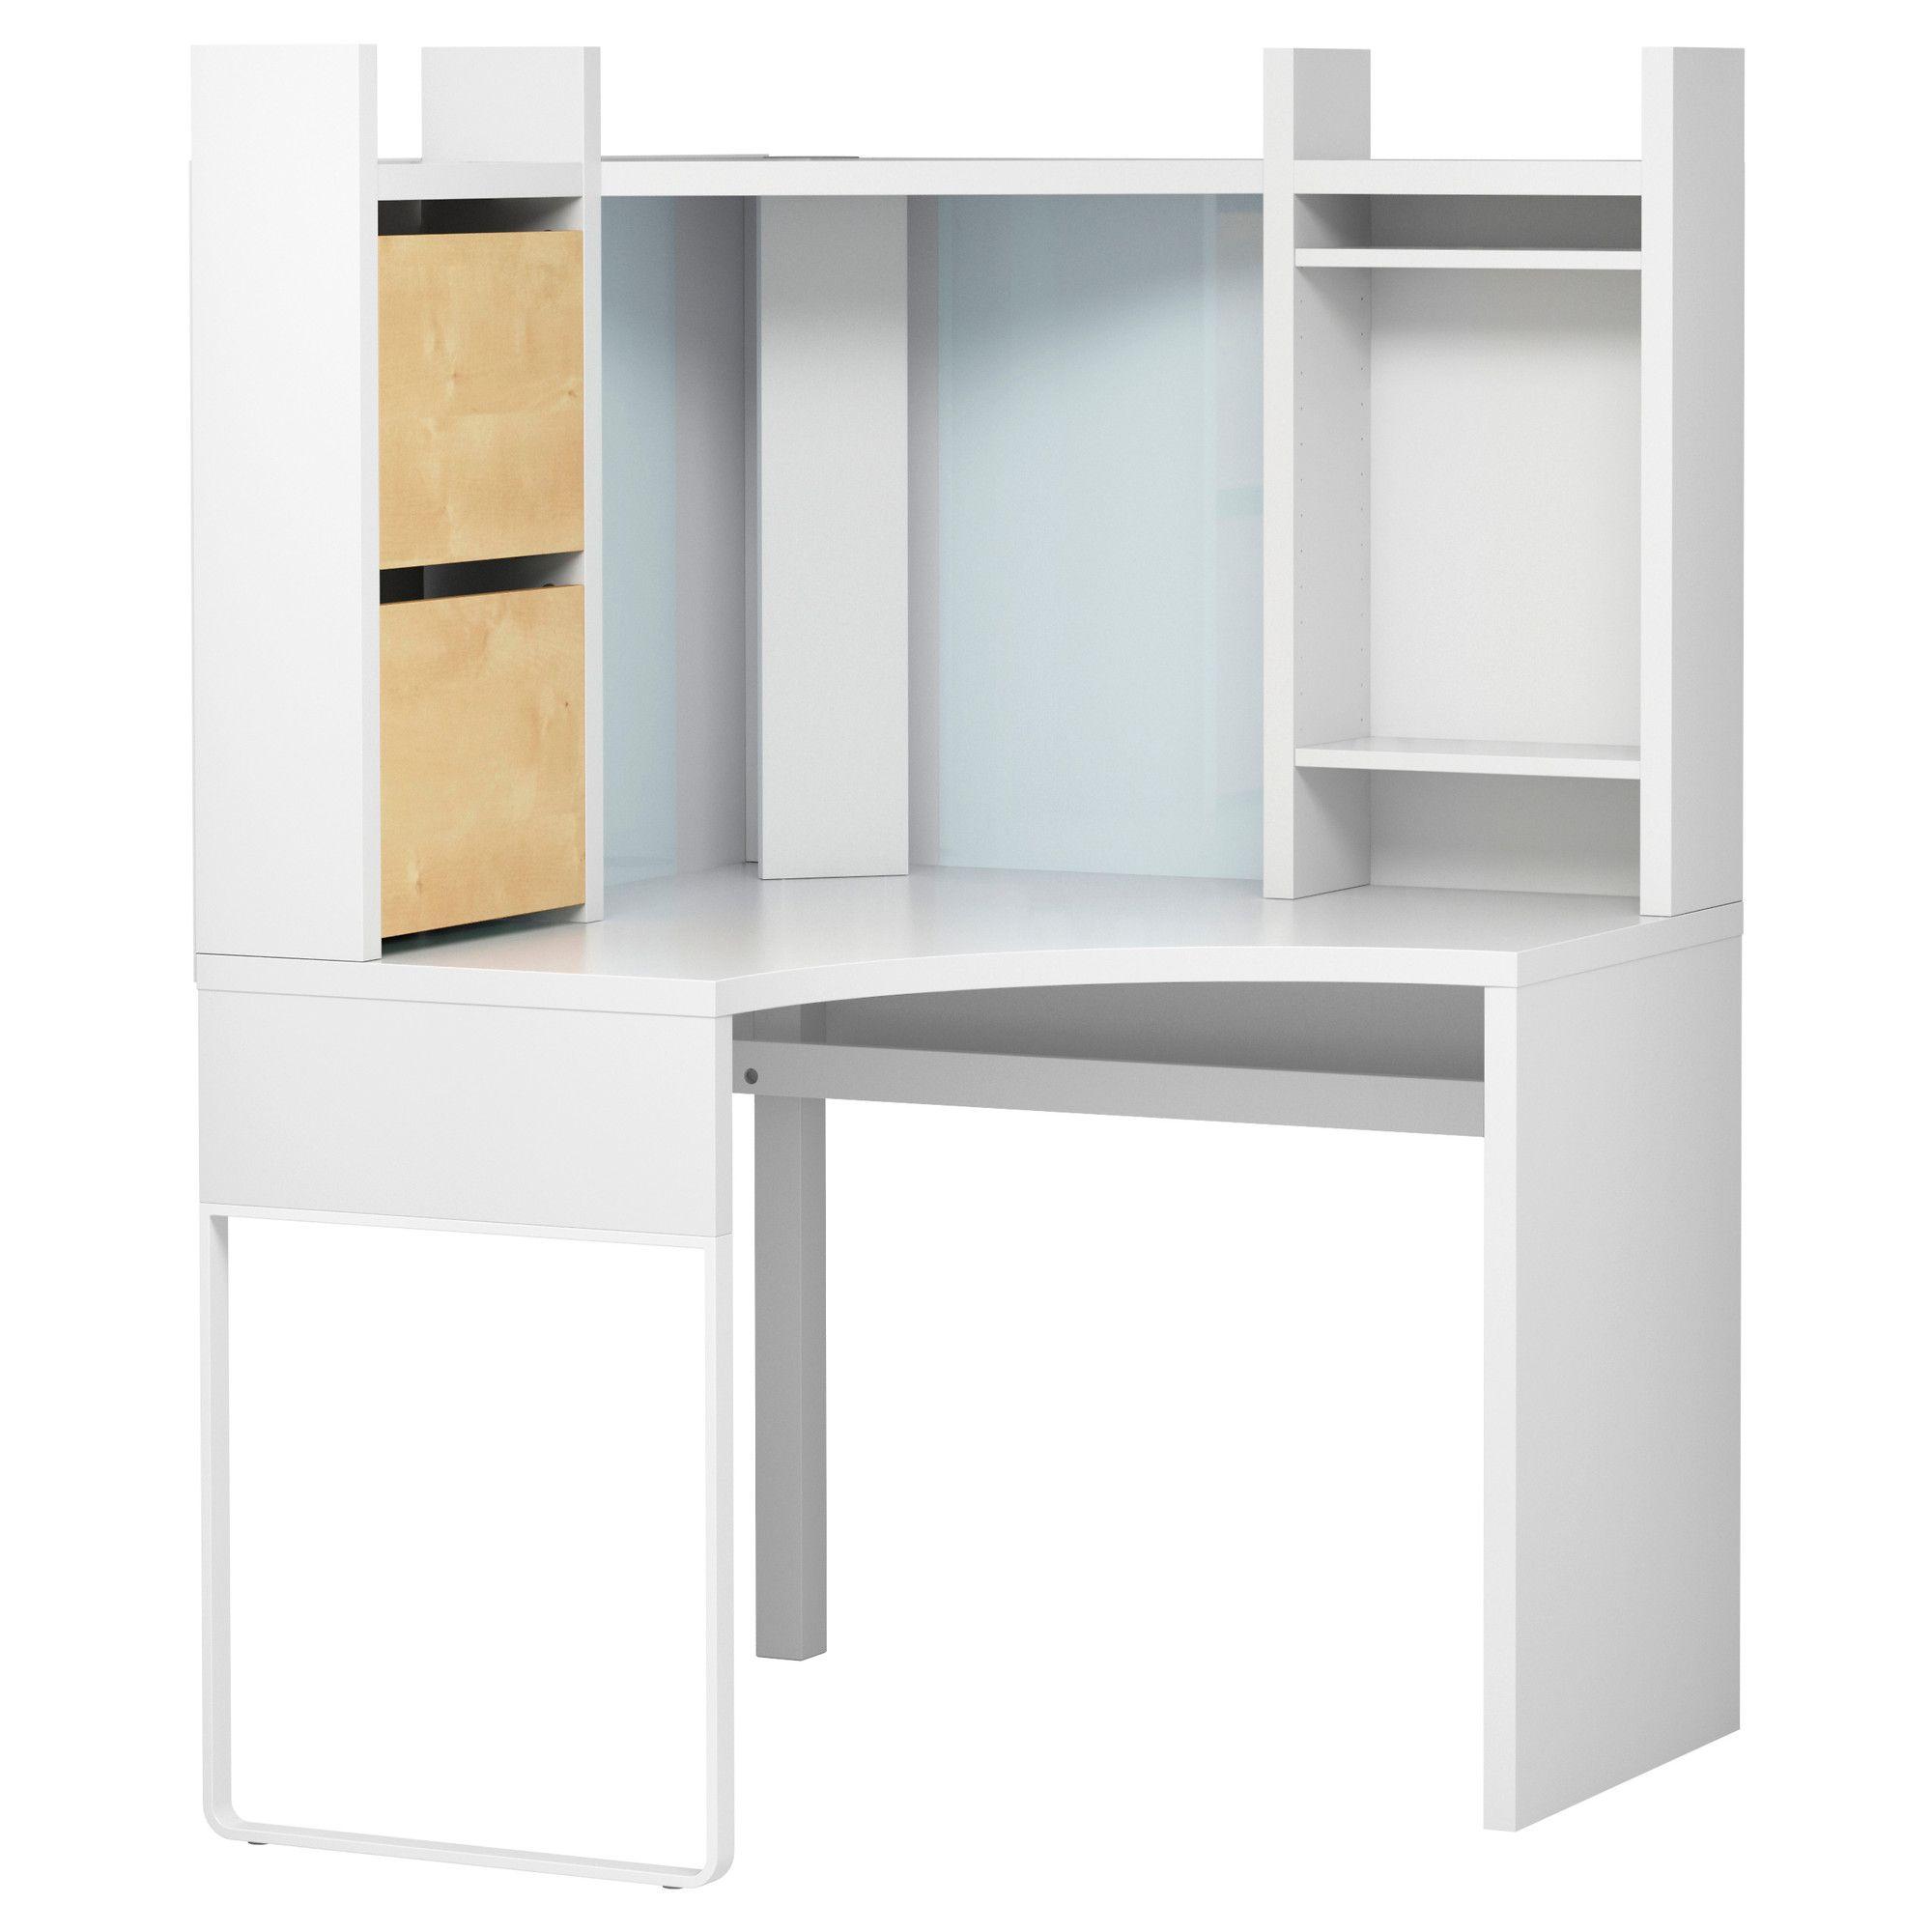 Ikea Us Furniture And Home Furnishings Corner Workstation Ikea Corner Desk Ikea Desk